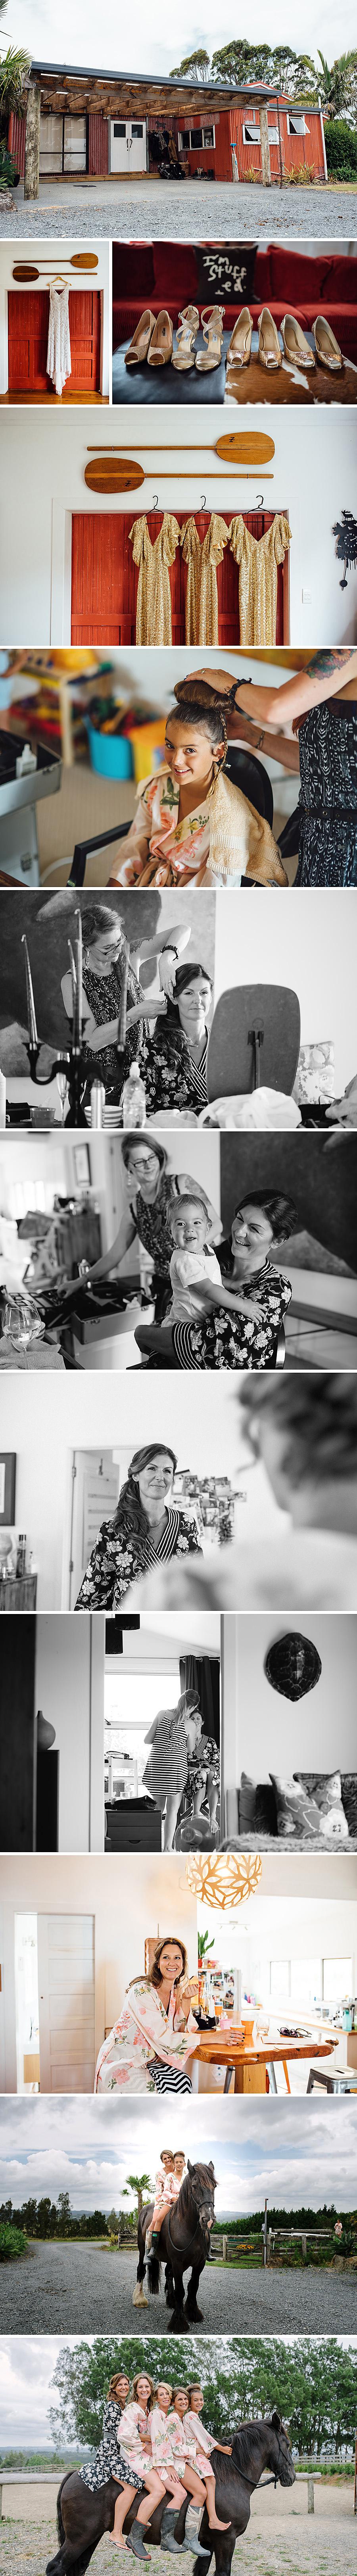 Wedding photographer Jess Burges, Kerikeri Wedding